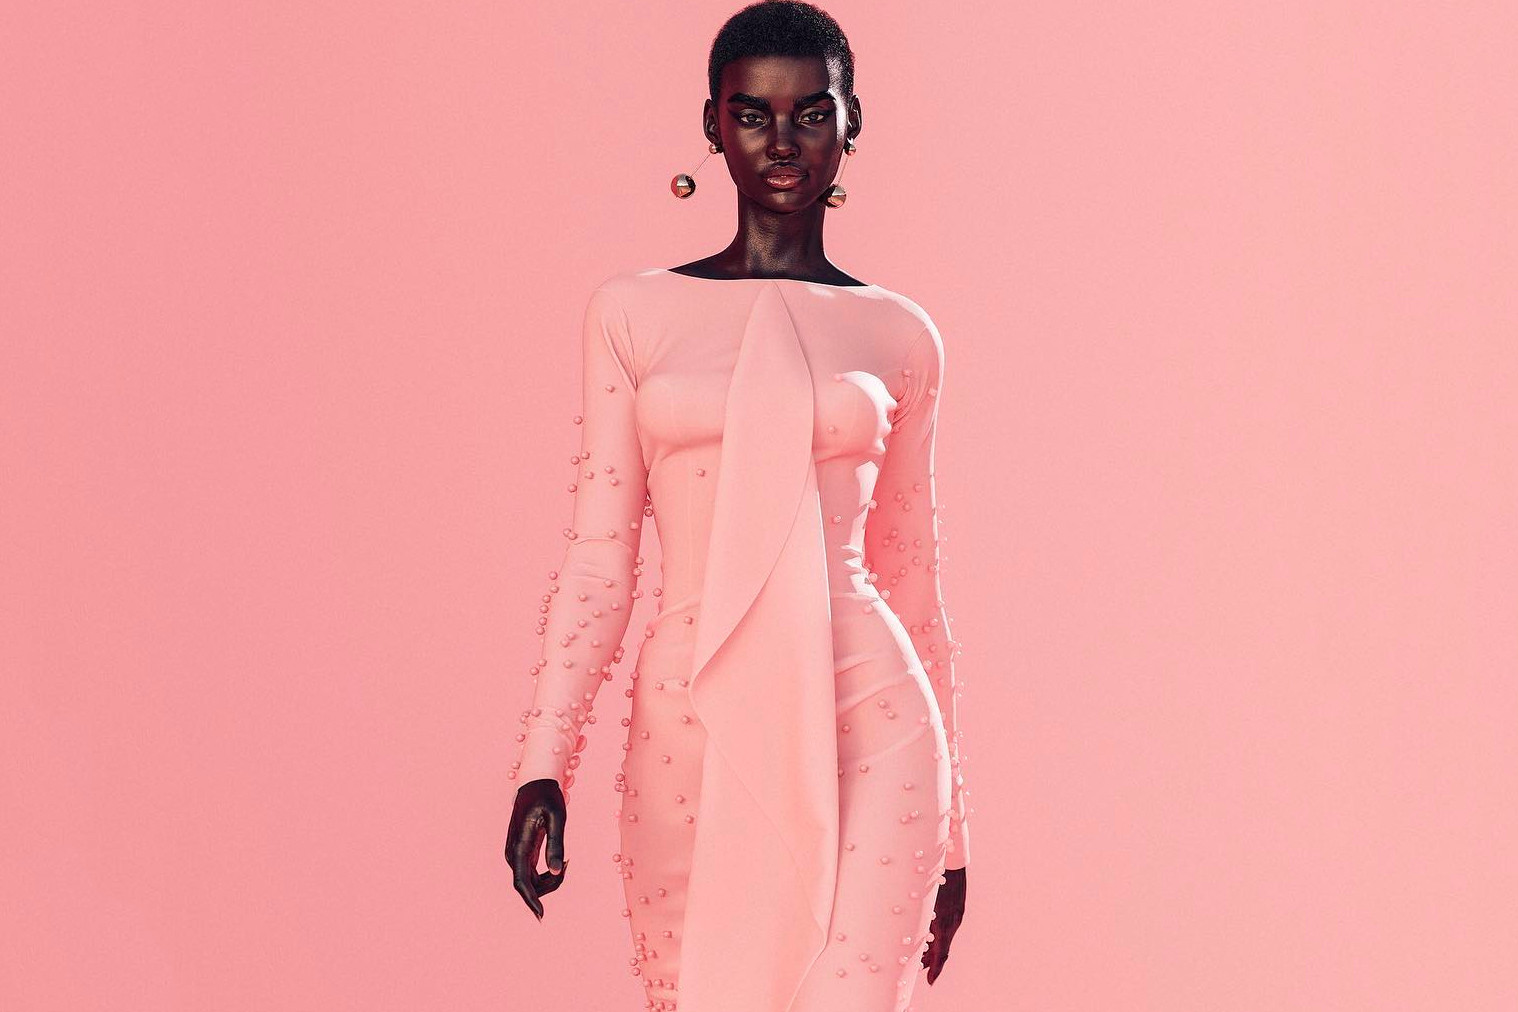 Lil Miquela Sousa Shudu Virtual AI Influencer Digital Marketing Instagram Social Media Model